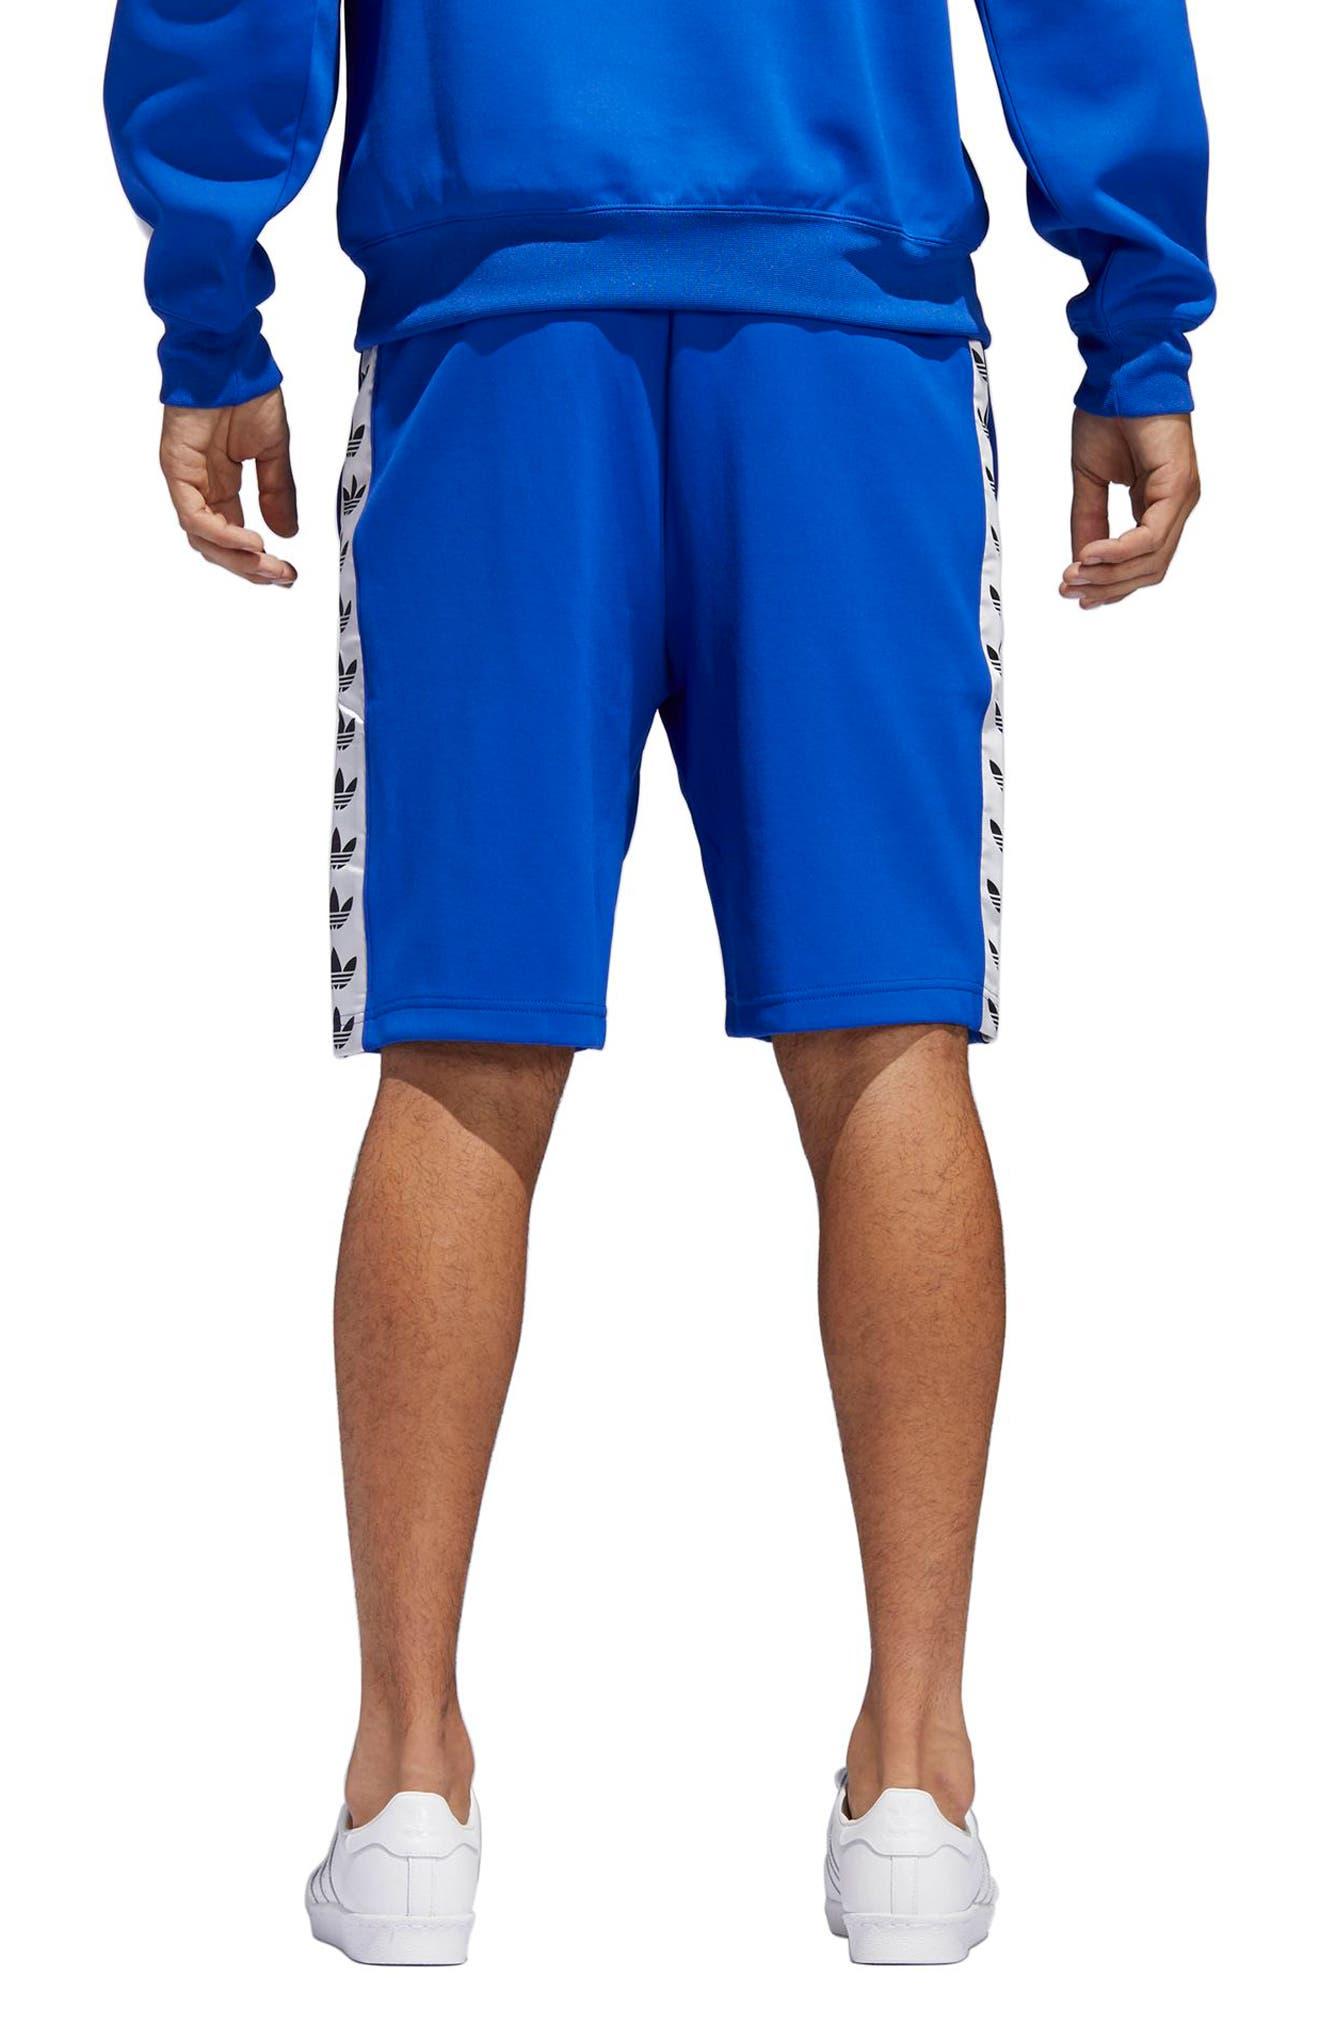 Originals TNT Shorts,                             Alternate thumbnail 2, color,                             Bold Blue